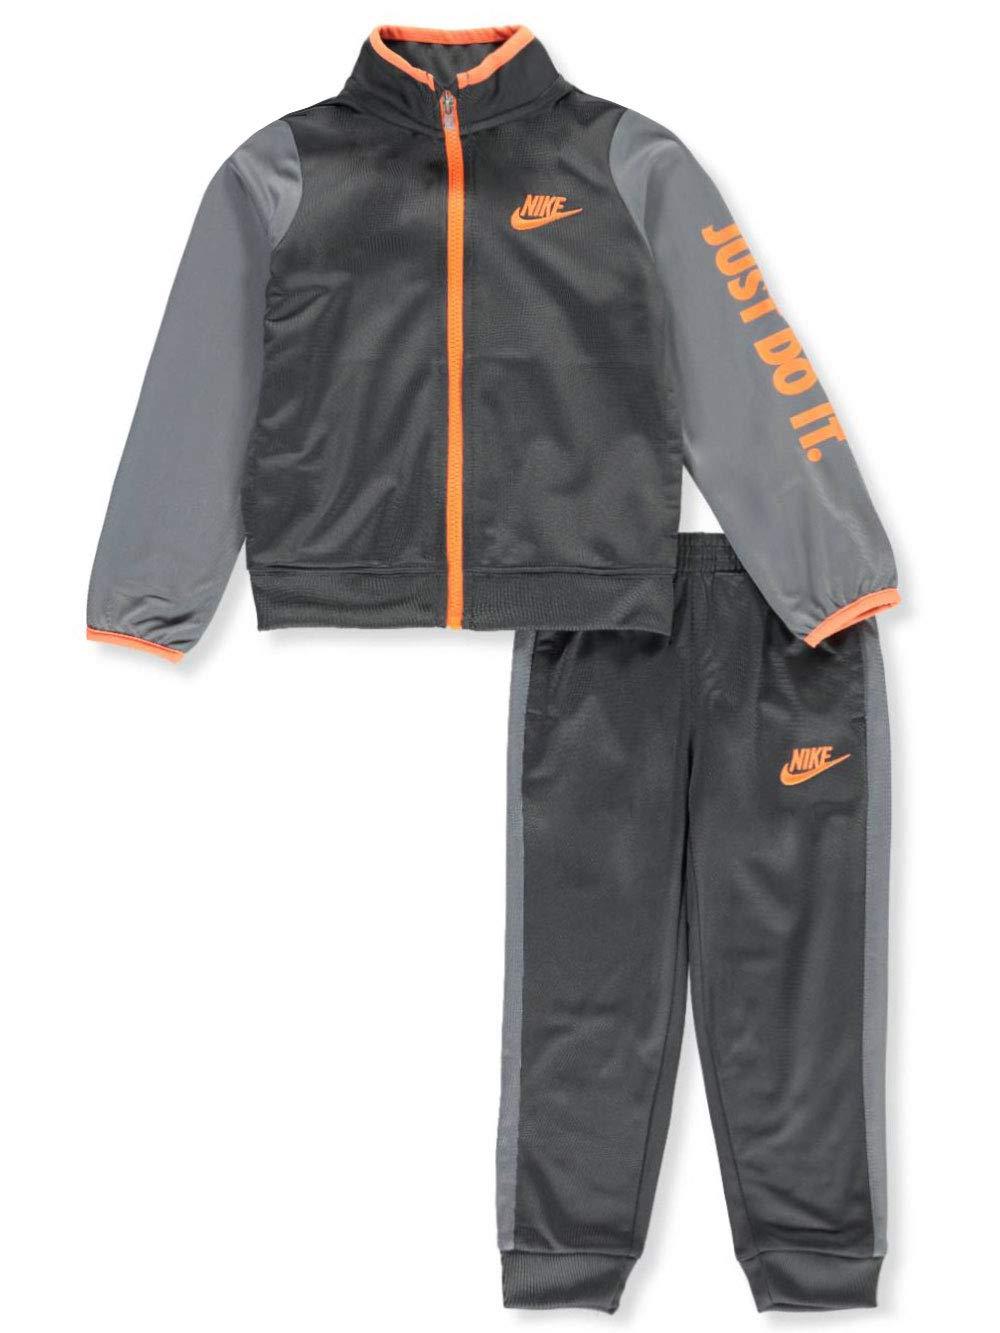 NIKE Boys Futura Tricot Jacket and Pants Set (Anthracite(76C626 ...